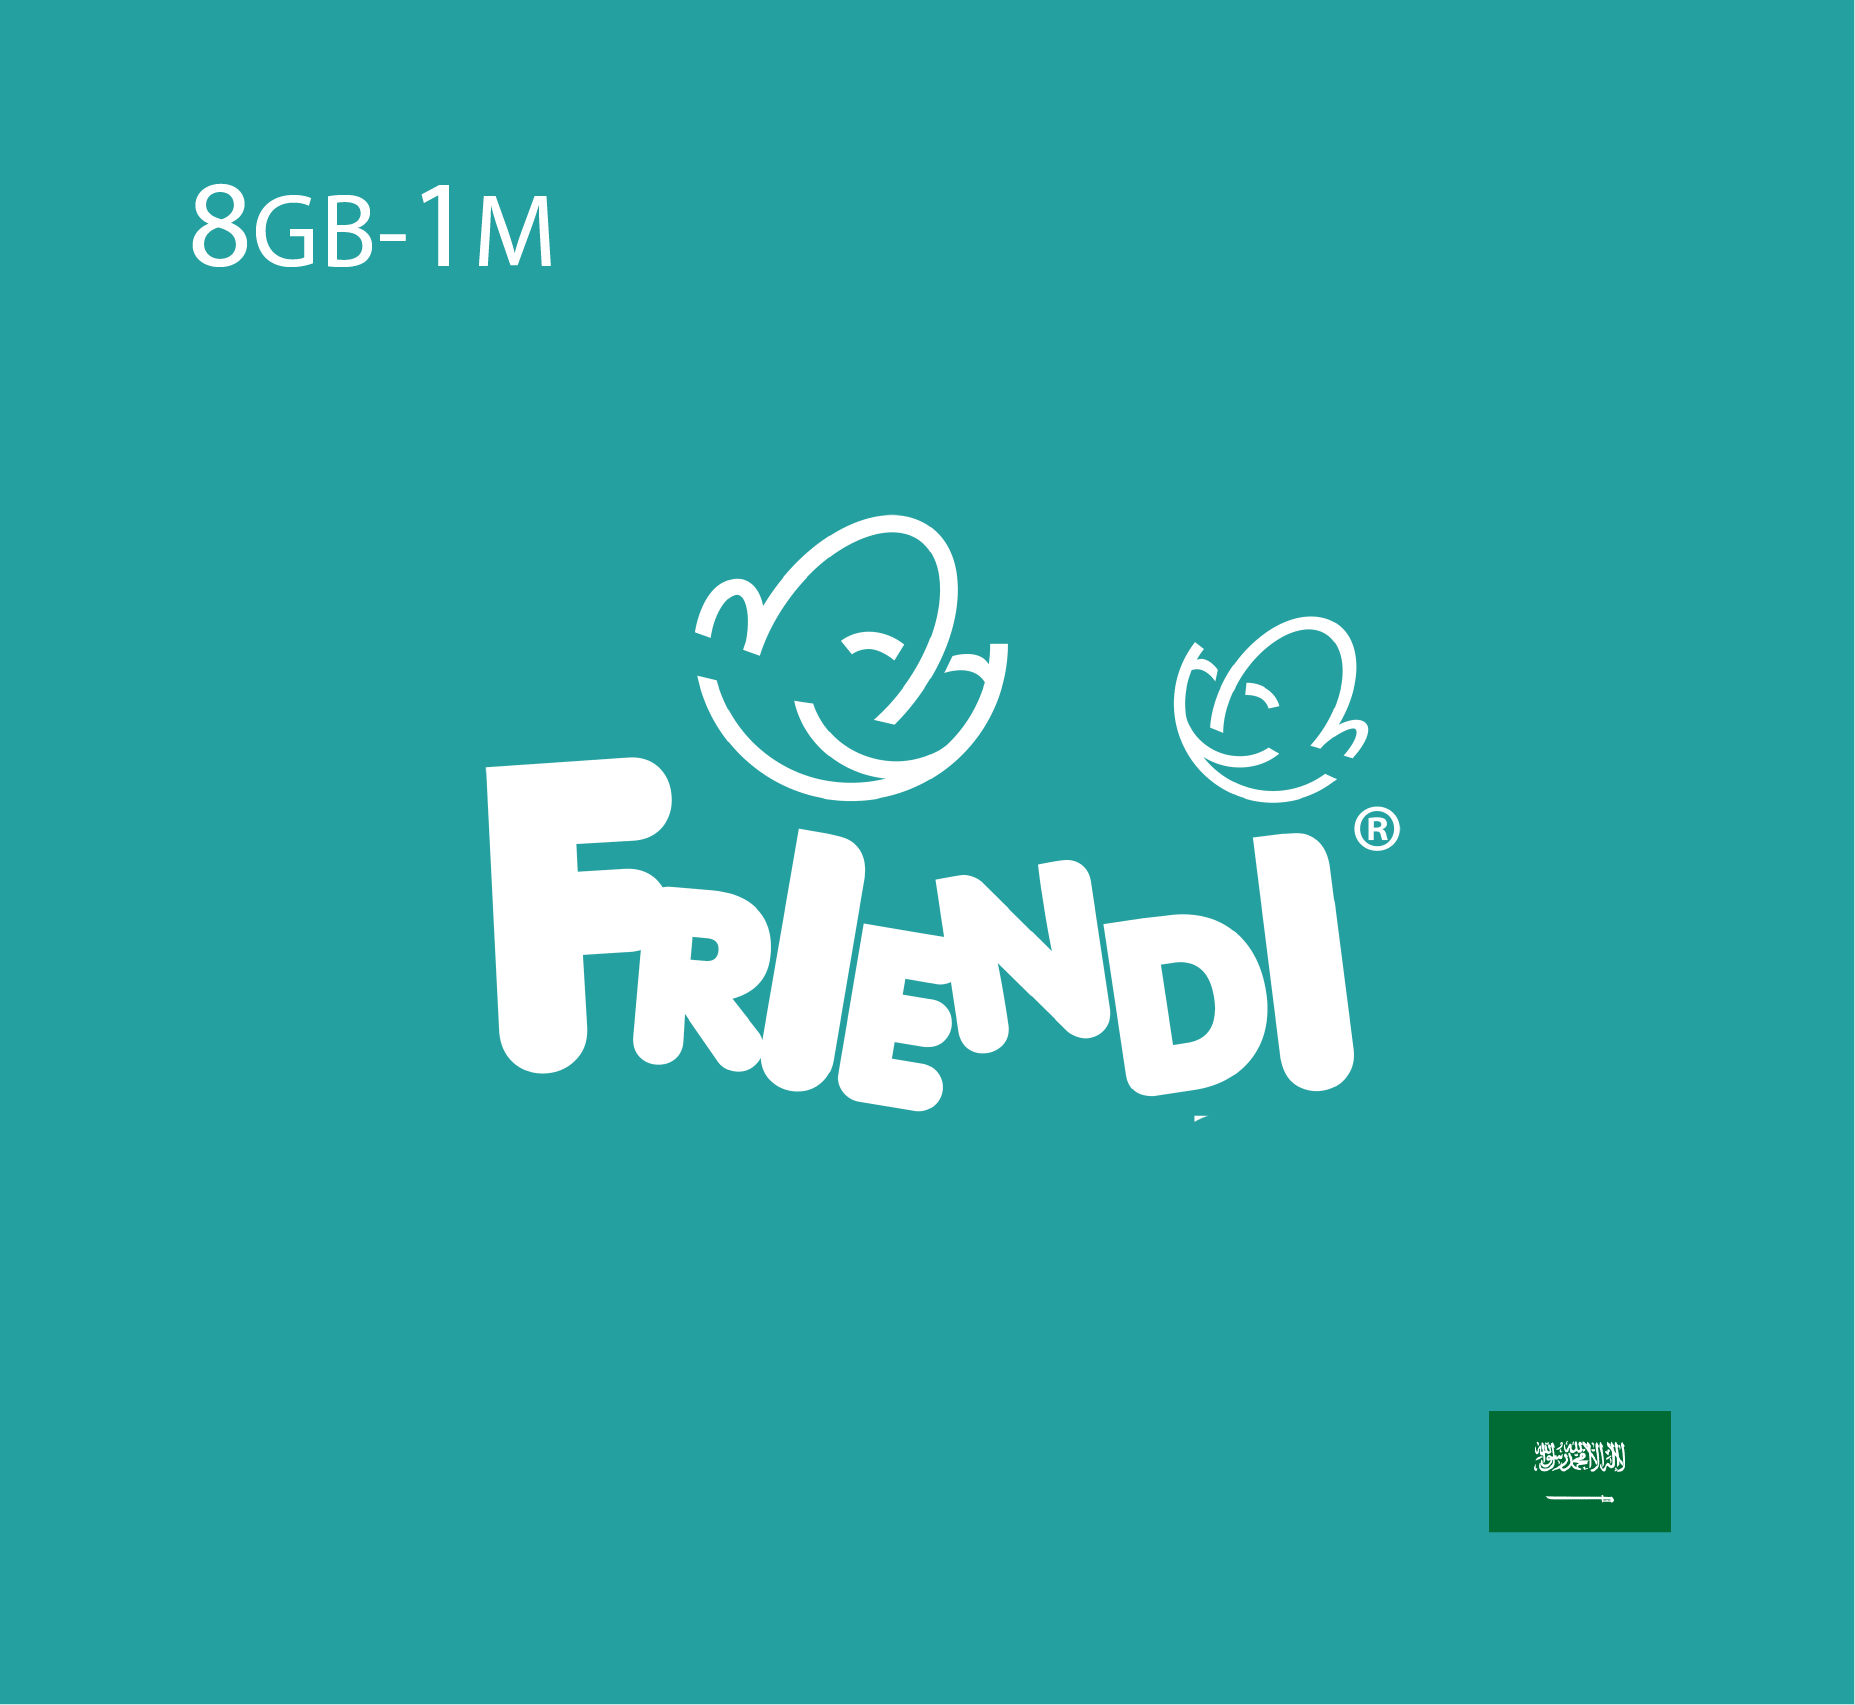 Friendi Data Recharge 8 GB - 1 Month